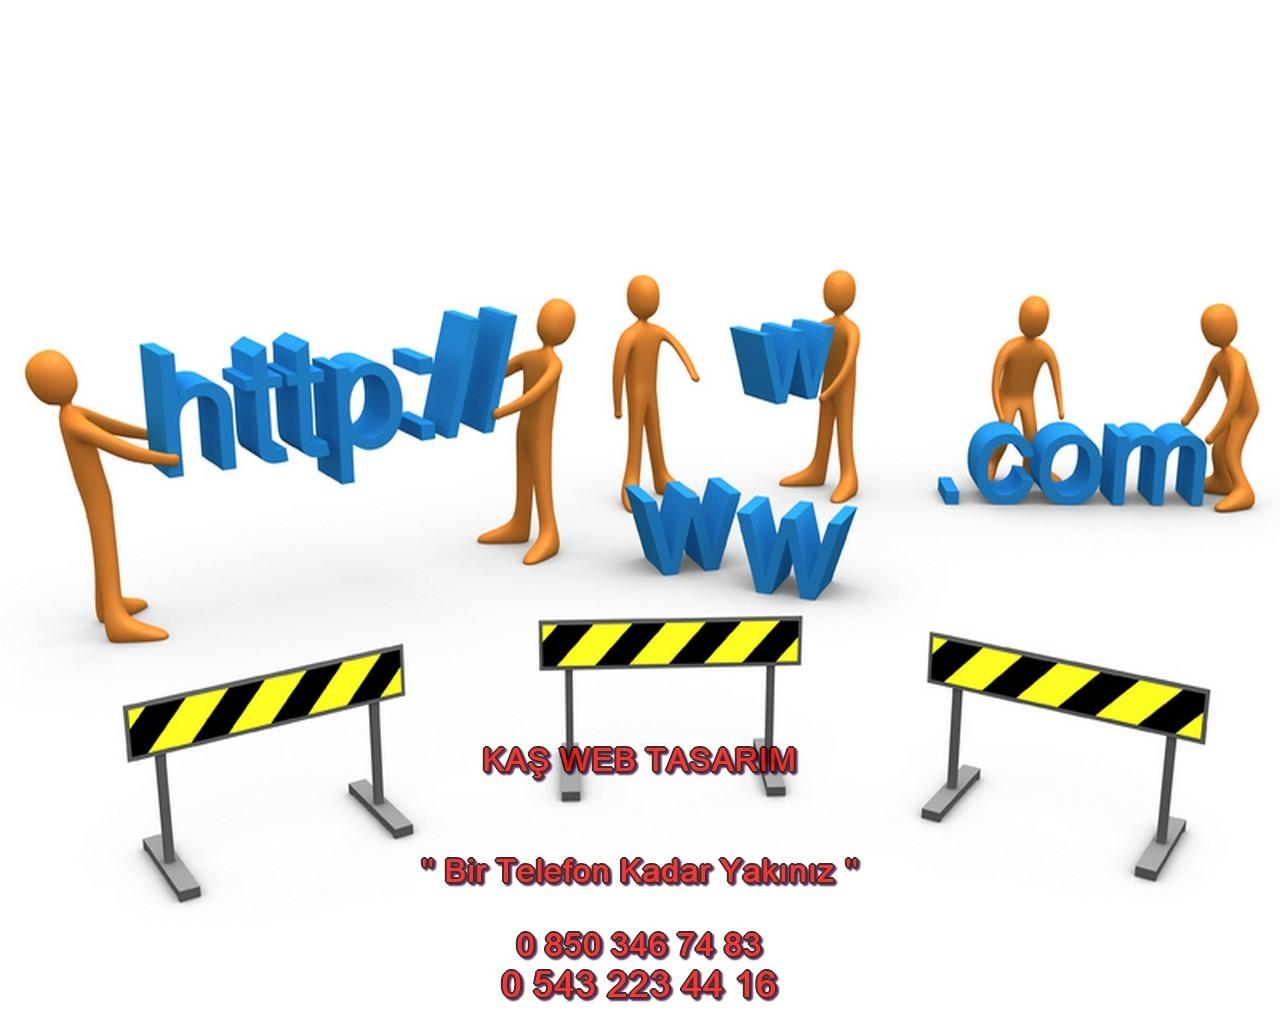 Kaş Web Tasarım